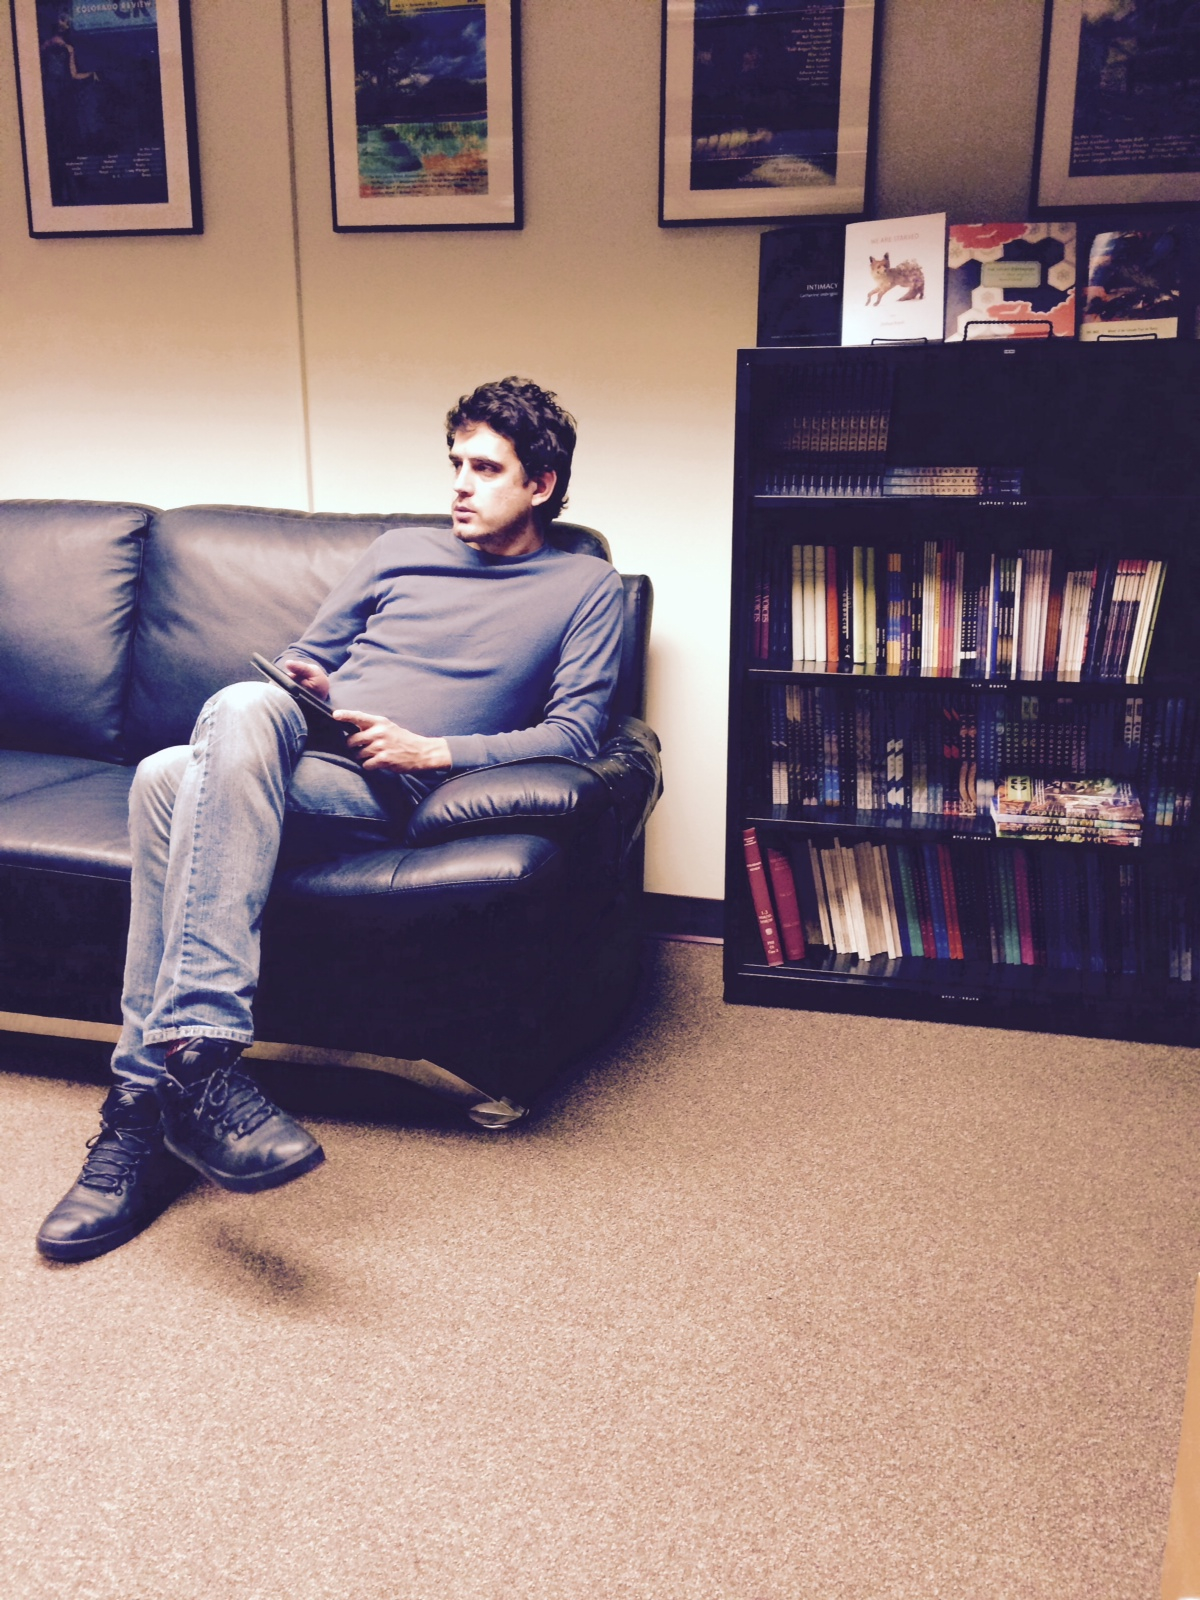 John McDonough: RCR Prose Editor